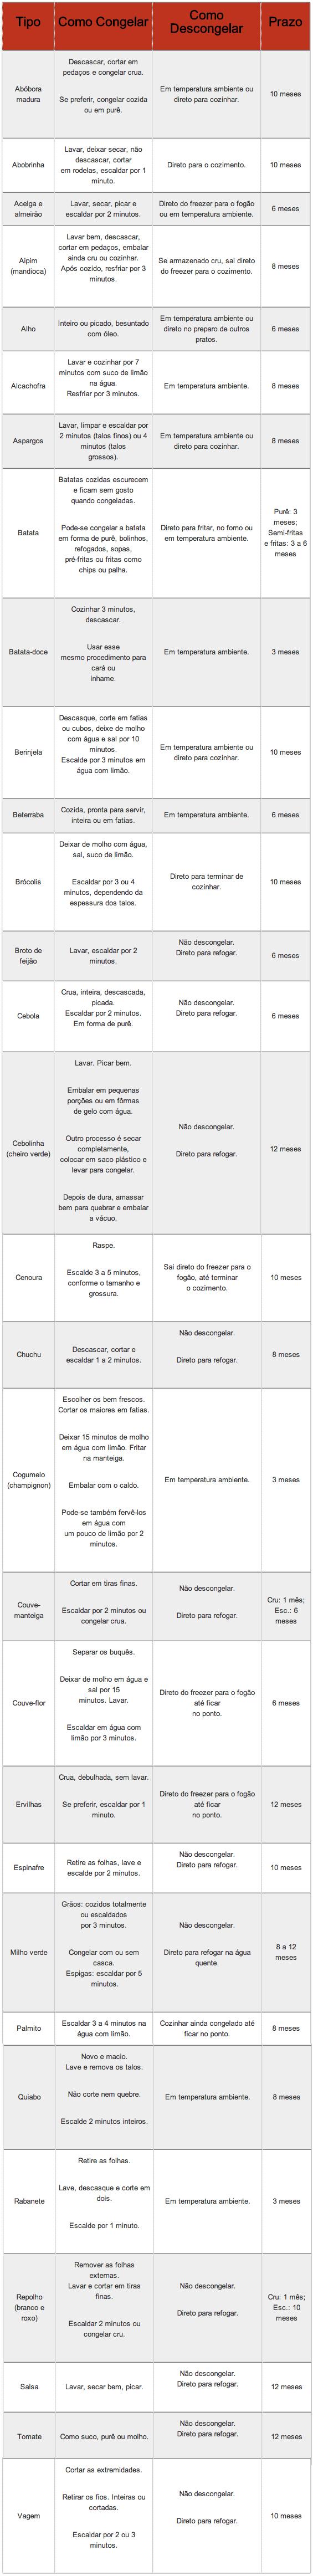 tabela-2-congelar-vegetais